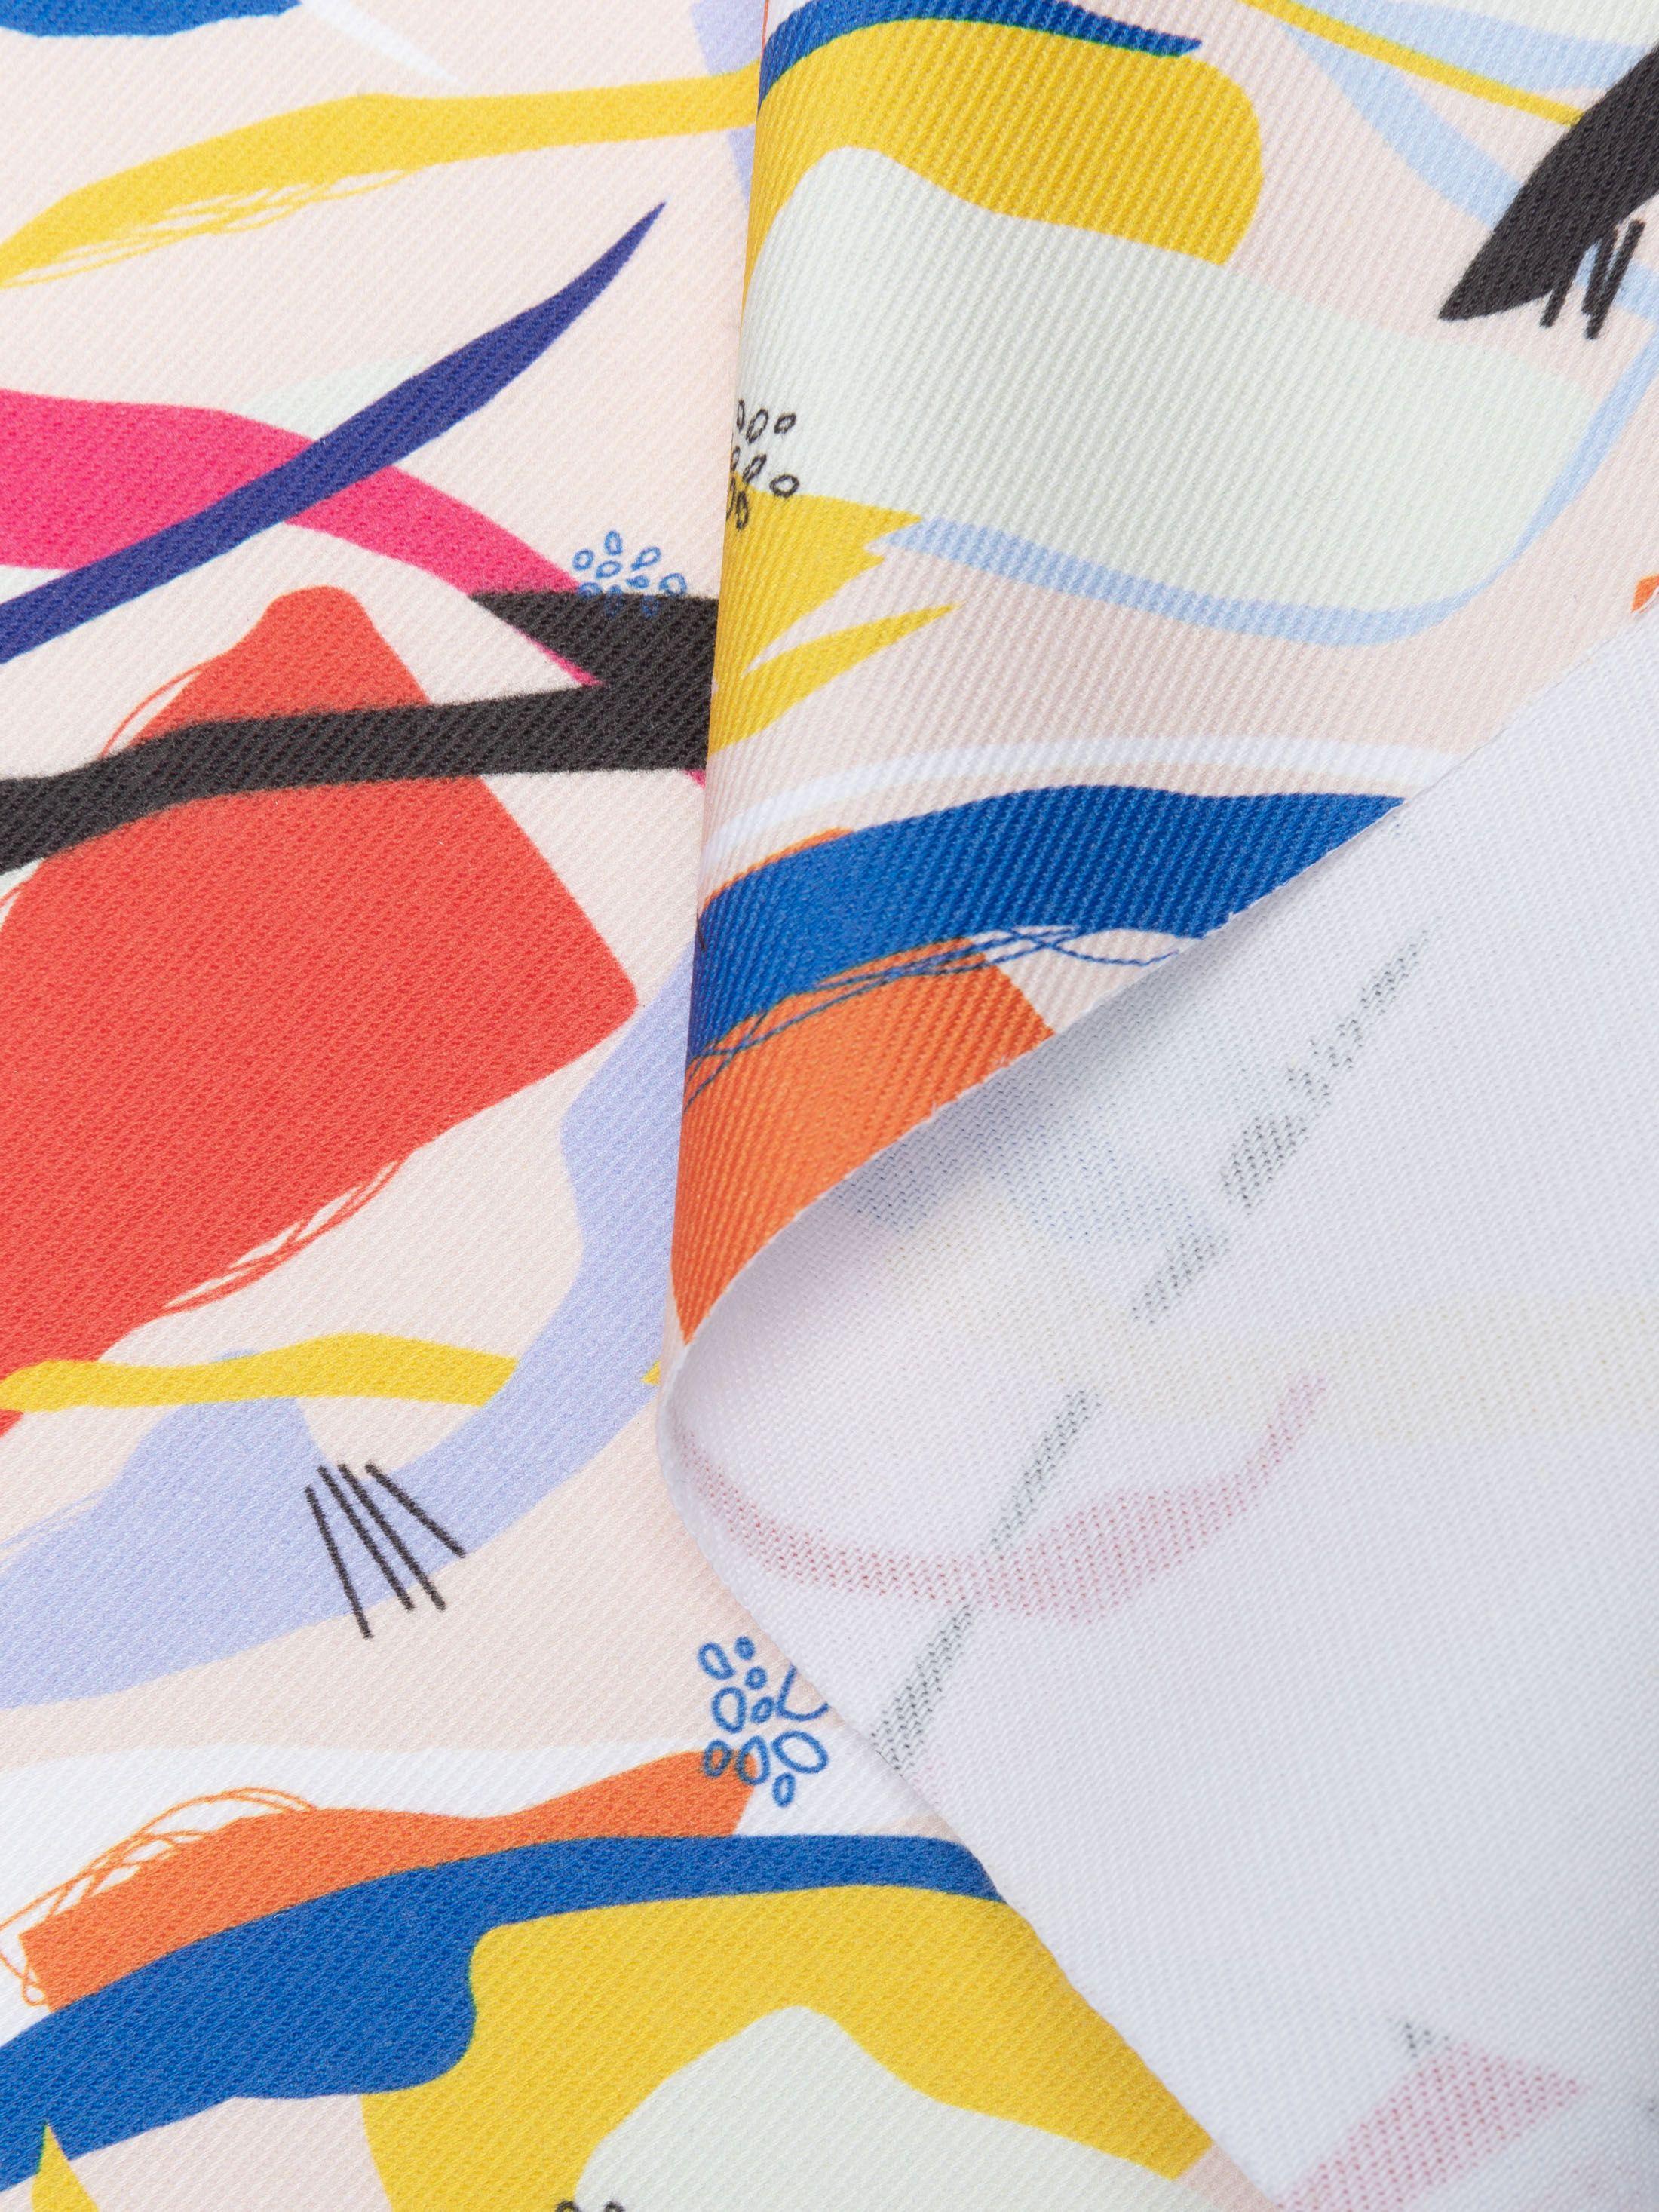 stampa su tessuto denim